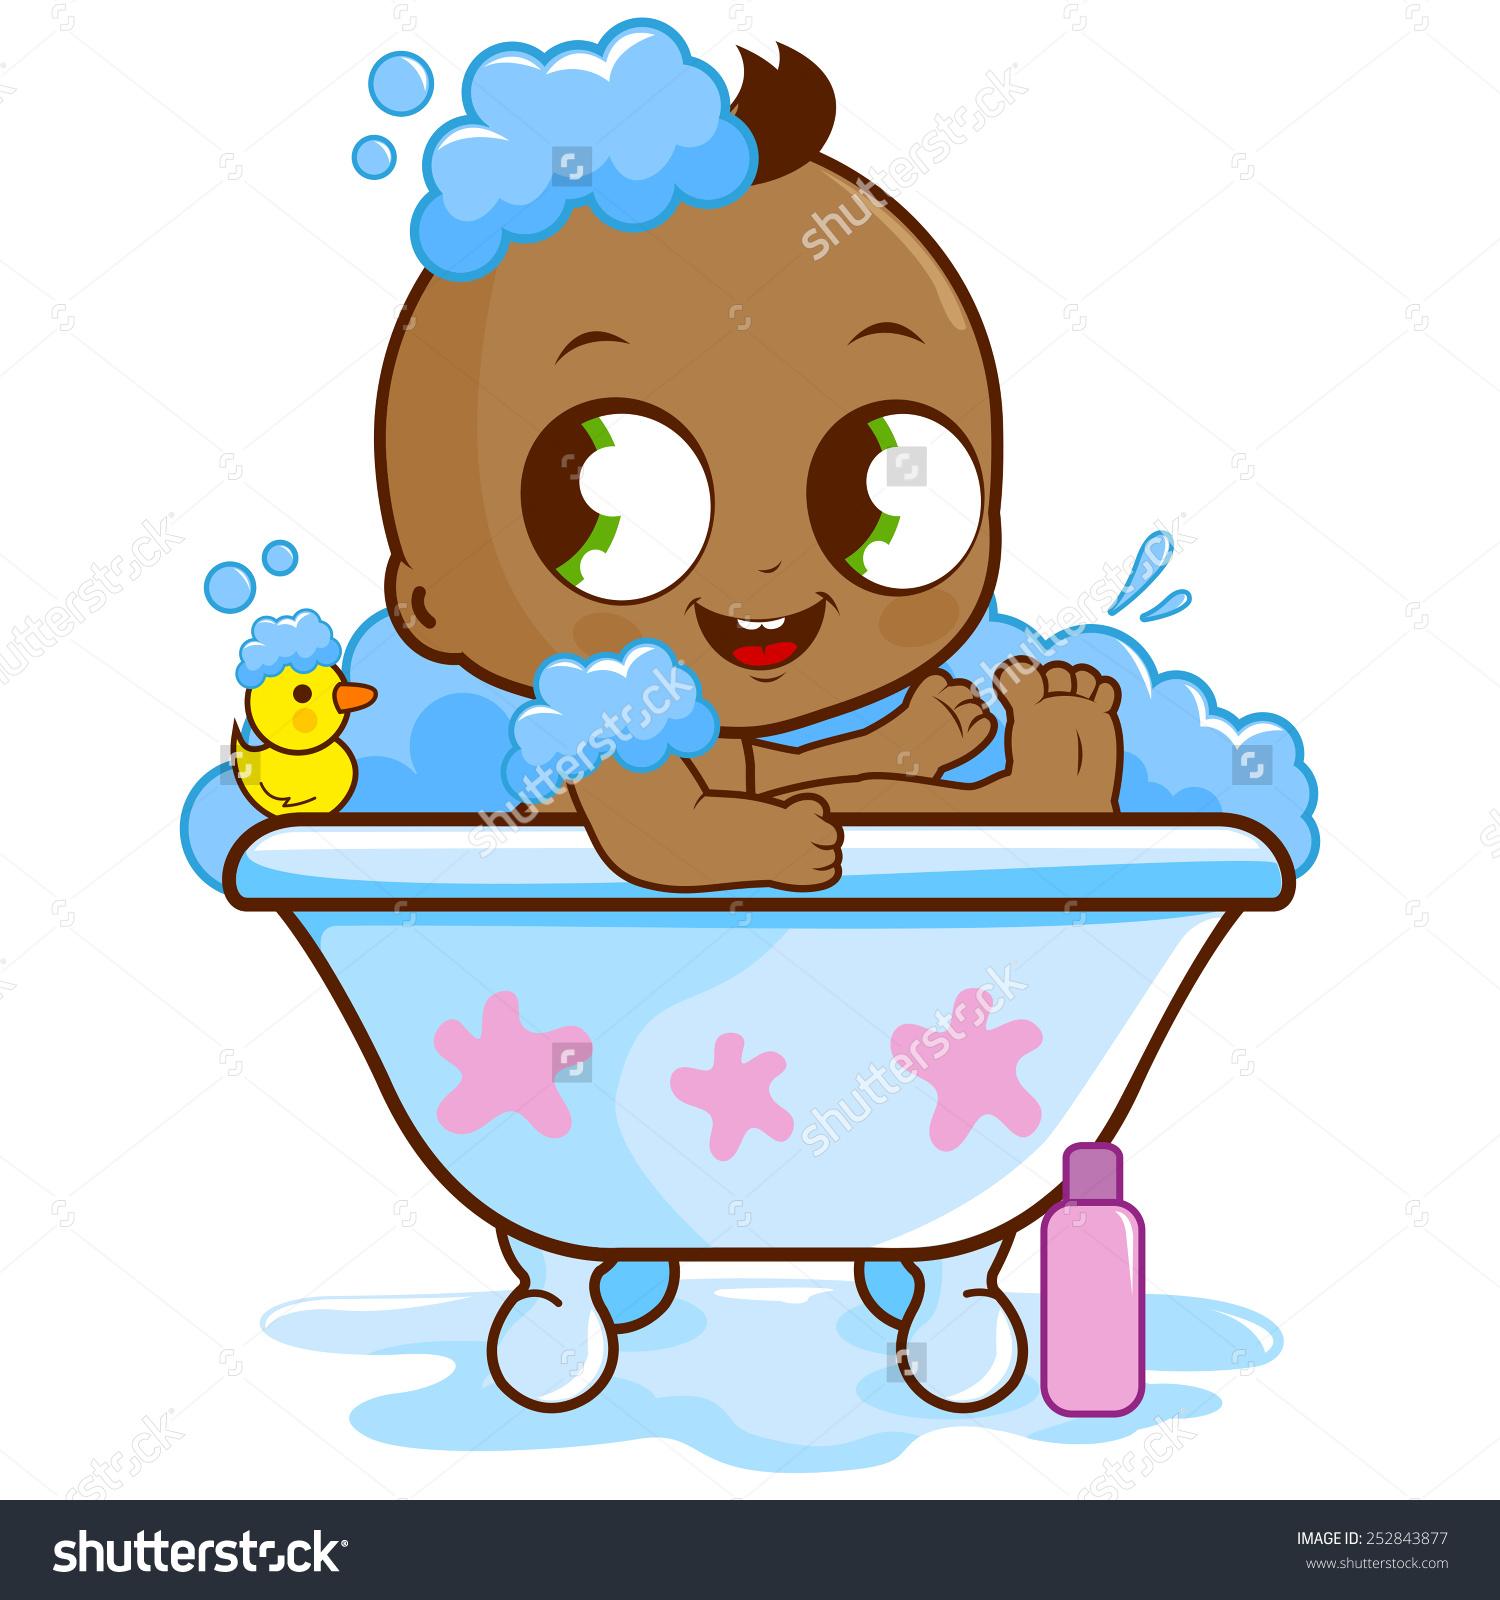 Bath clipart animated. Black boy take a